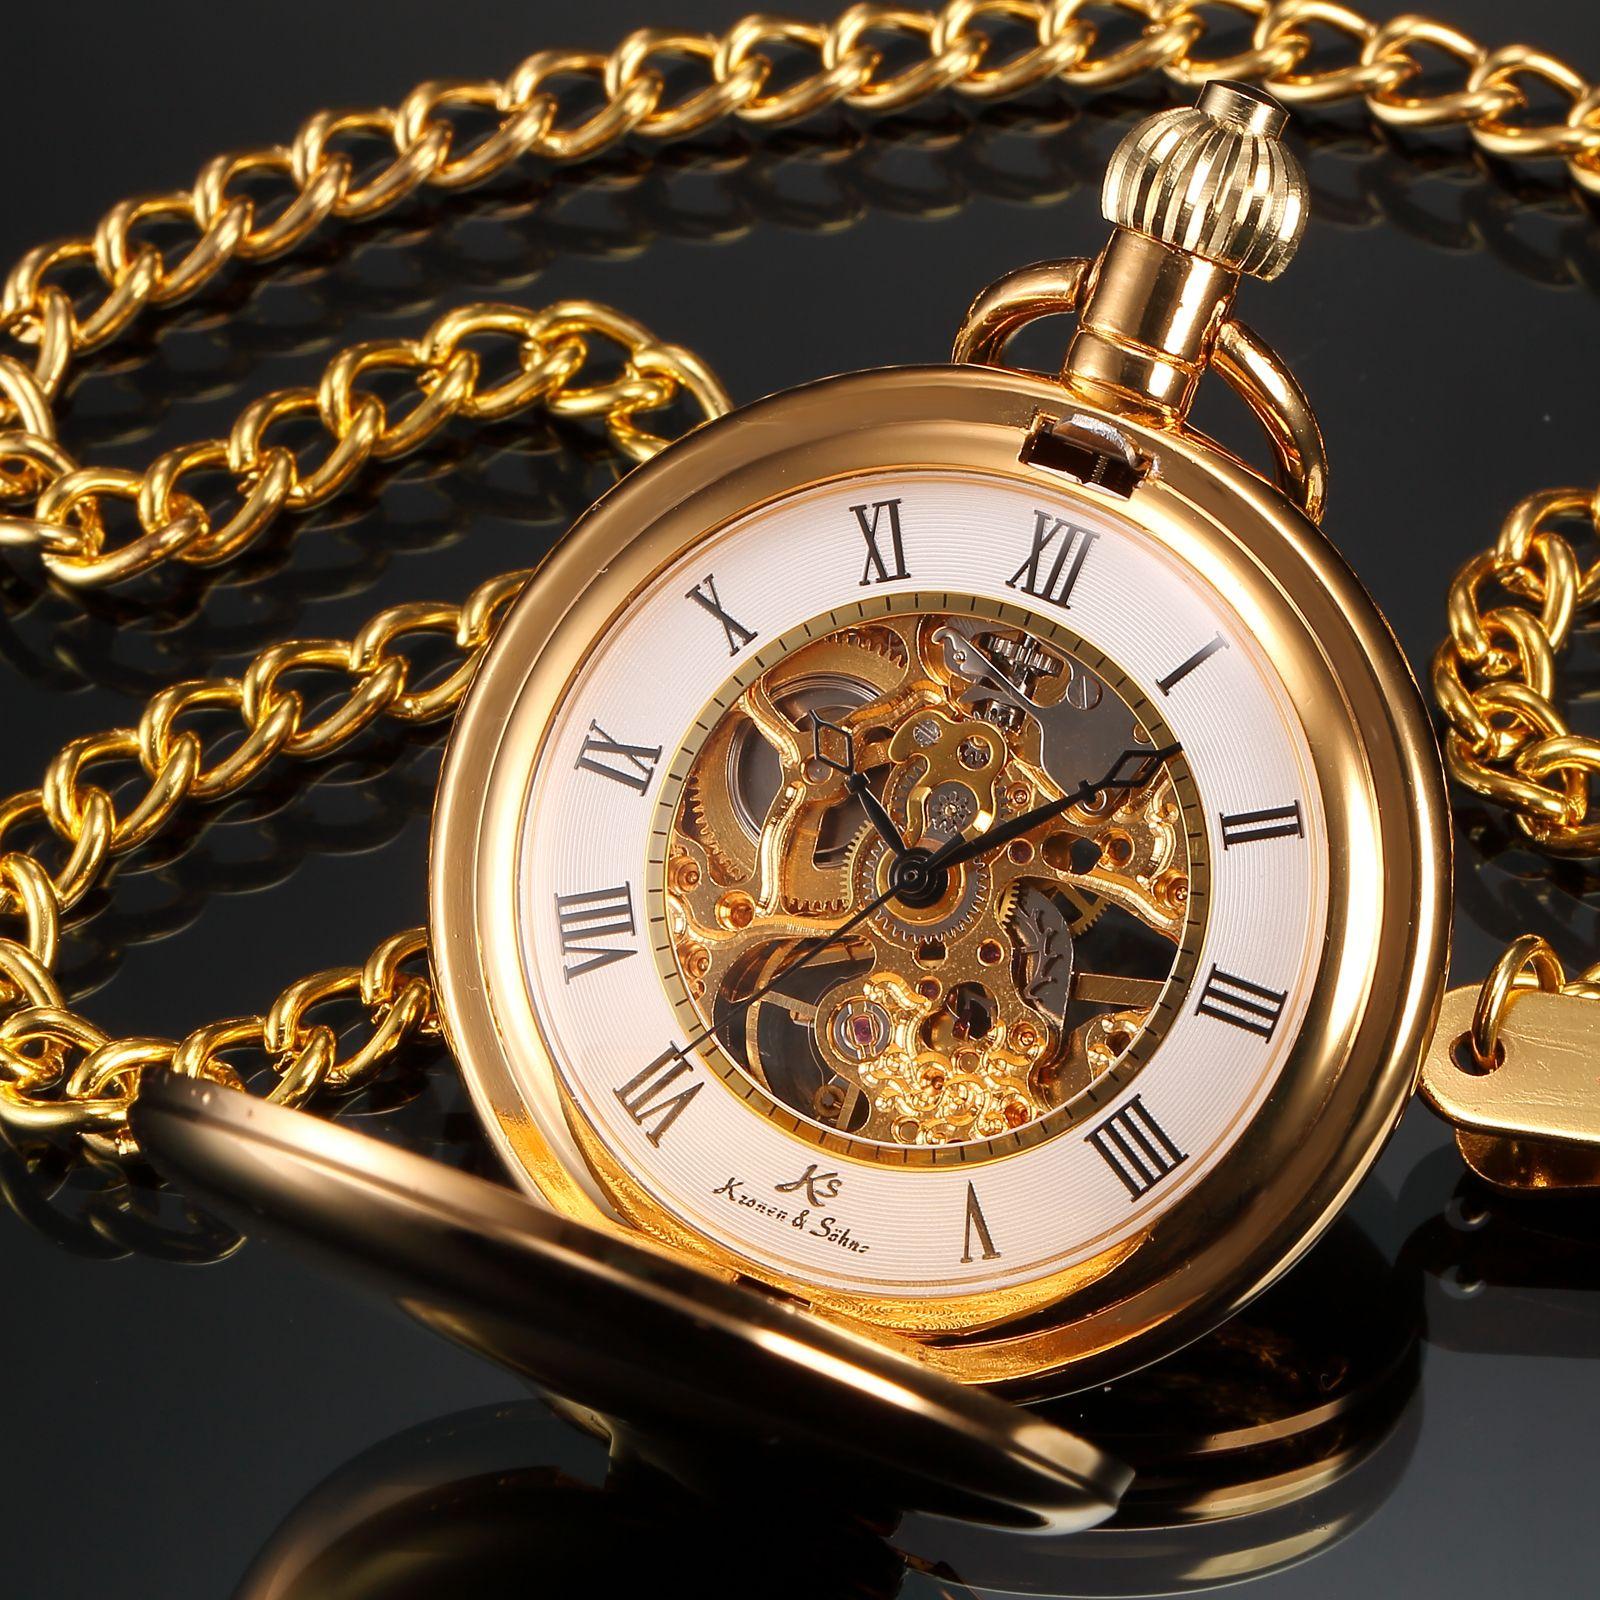 ks pocket watch golden best luxury watch r numbers golden ks pocket watch golden best luxury watch r numbers golden alloy case mechanical handwinding men s pocket